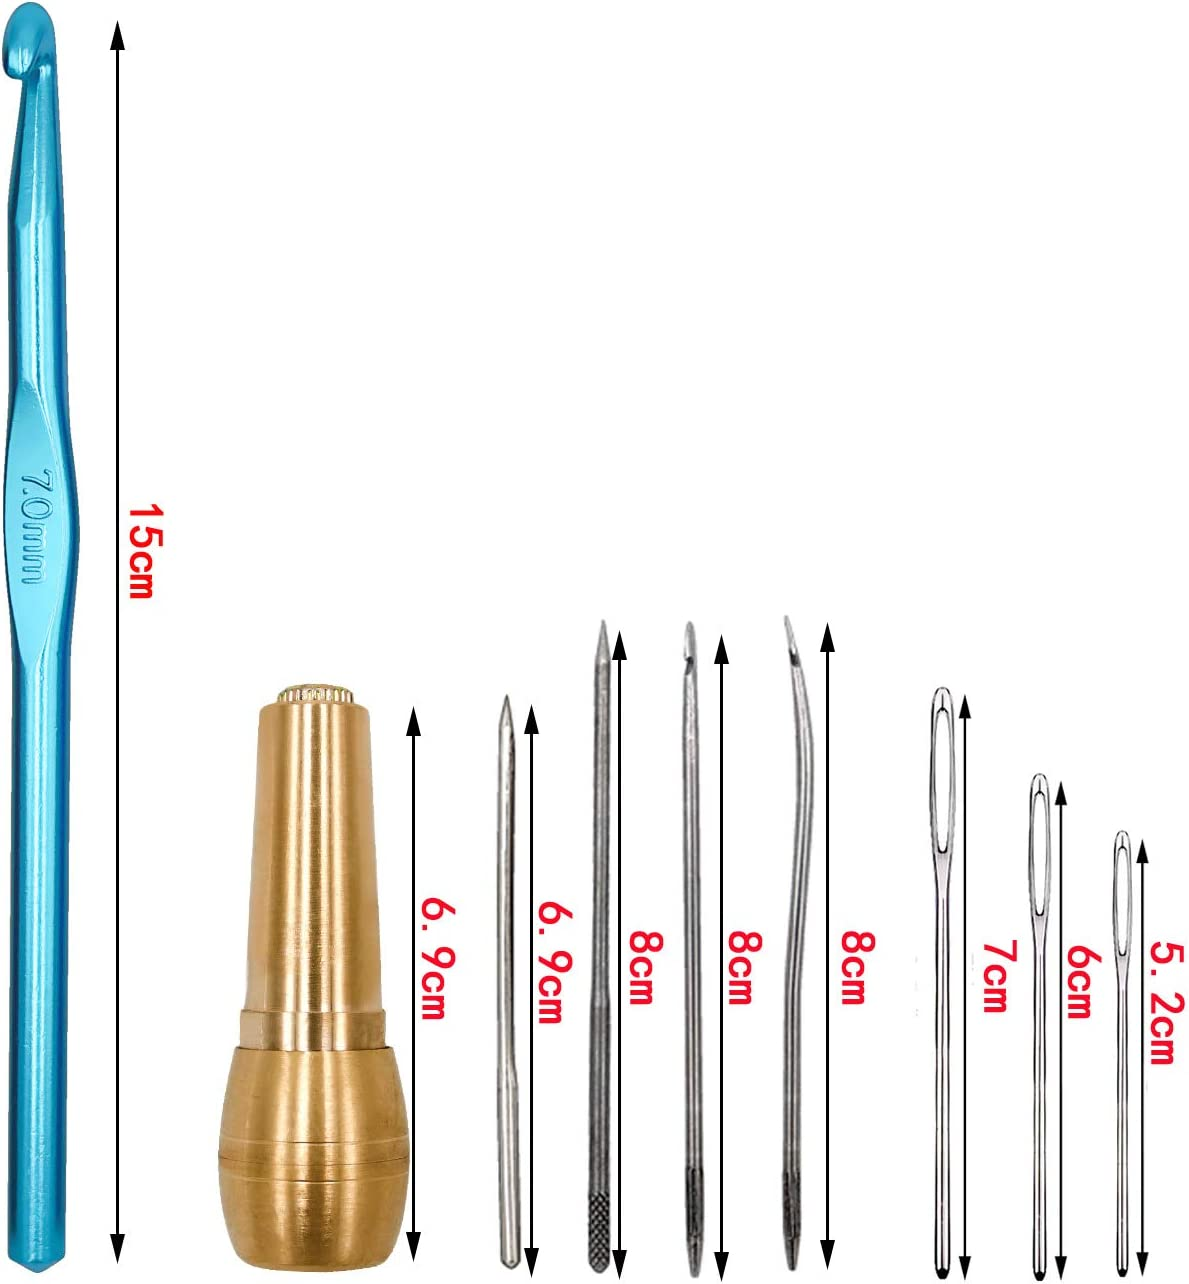 S-Mechanic H/äkelnadeln-Set,14 St/ück Volle Gr/ö/ßE 2mm-10mm Style 1 H/äkelnadeln Stricknadeln aus,Aluminium H/äkelnadeln Stricknadeln Weben Nadeln H/äkelhaken Set